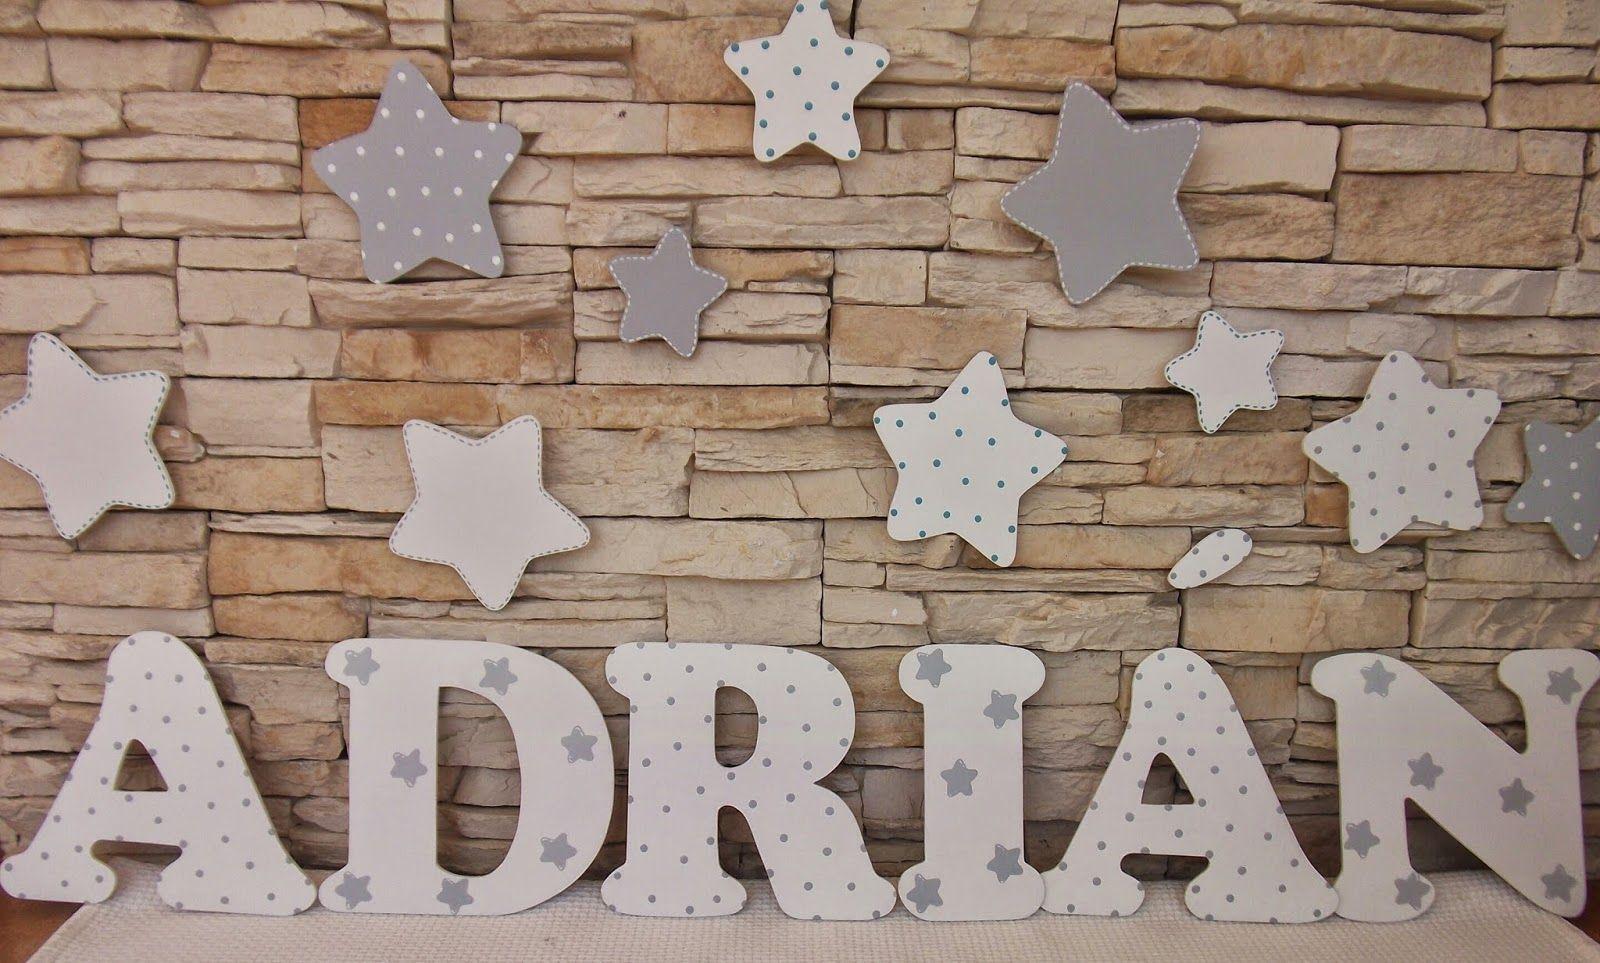 Decoraci n infantil pekerines letras de madera para habitaciones infantiles http pekerines - Letras de madera para decorar ...